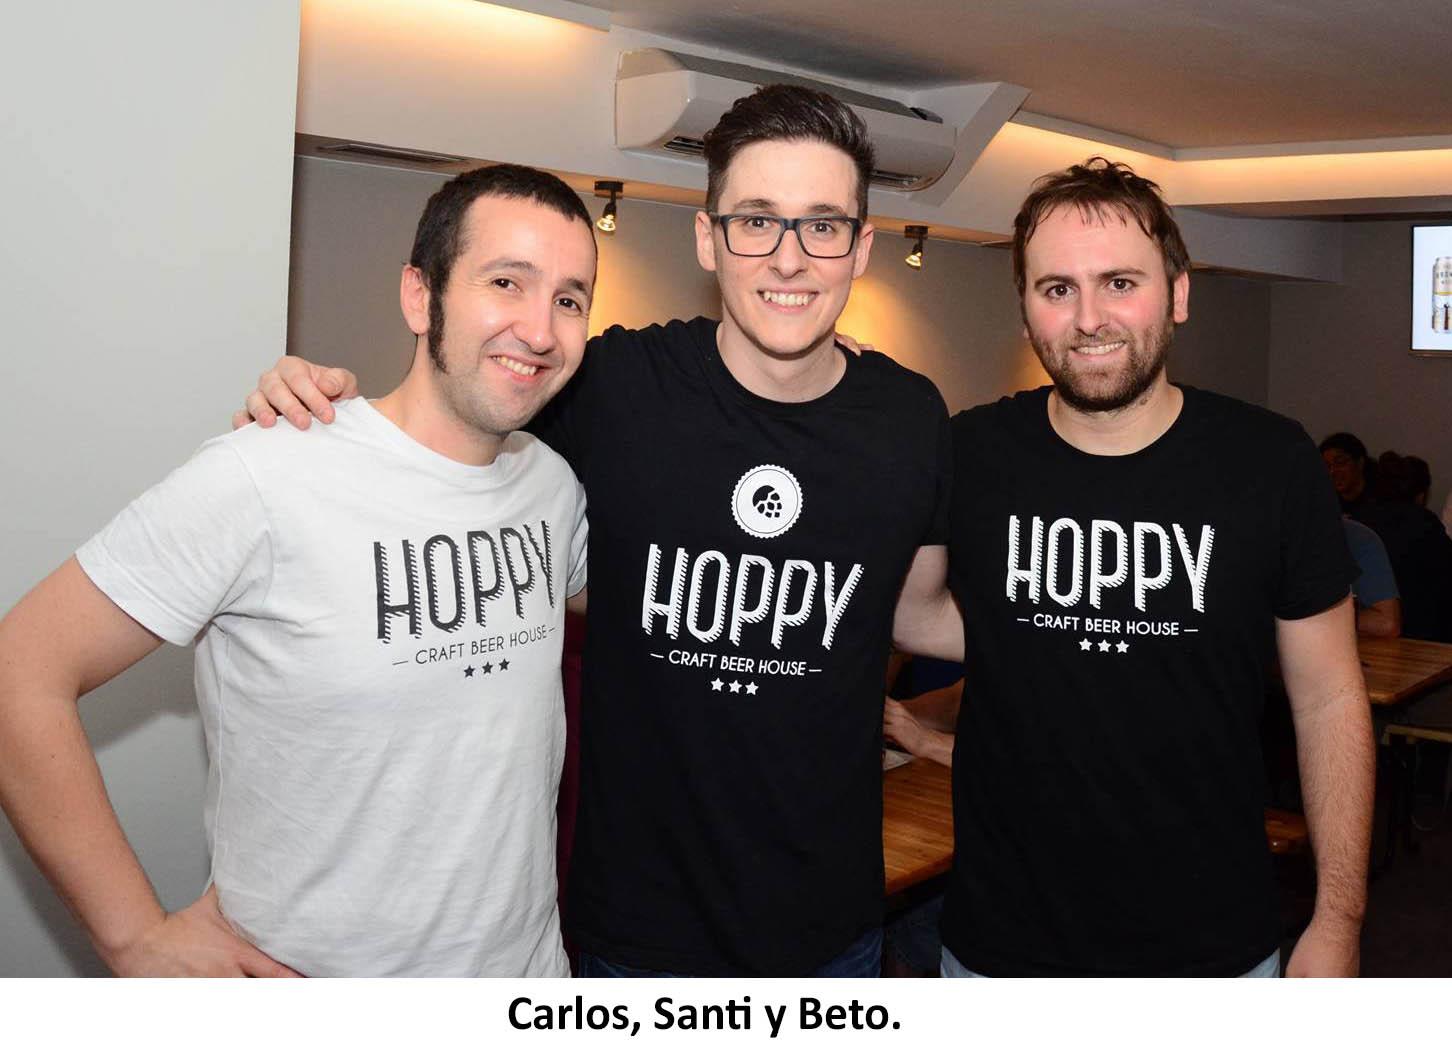 Carlos, Santi y Beto Hoppy